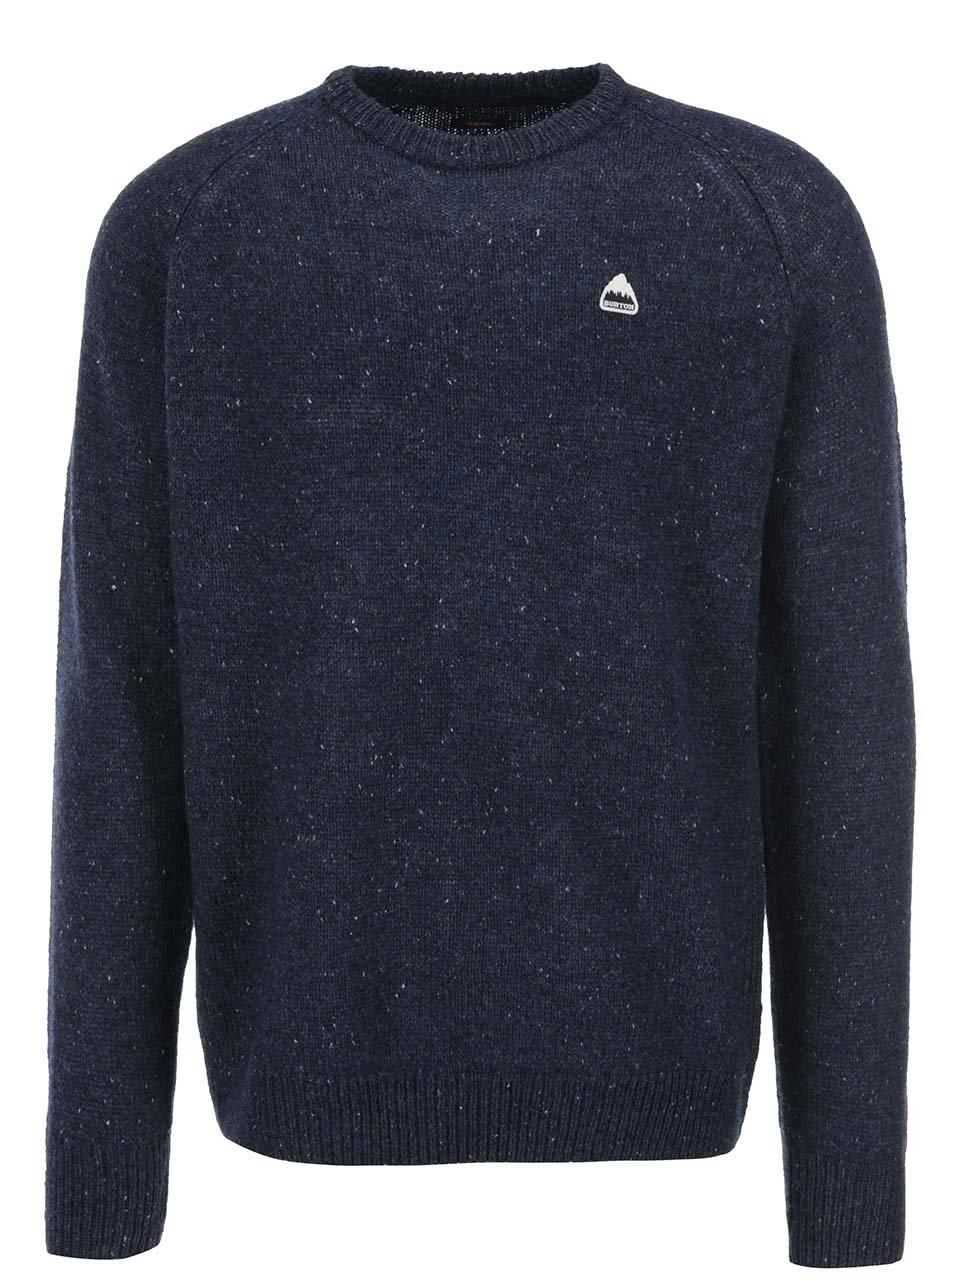 Tmavě modrý vlněný pánský svetr Burton Gus